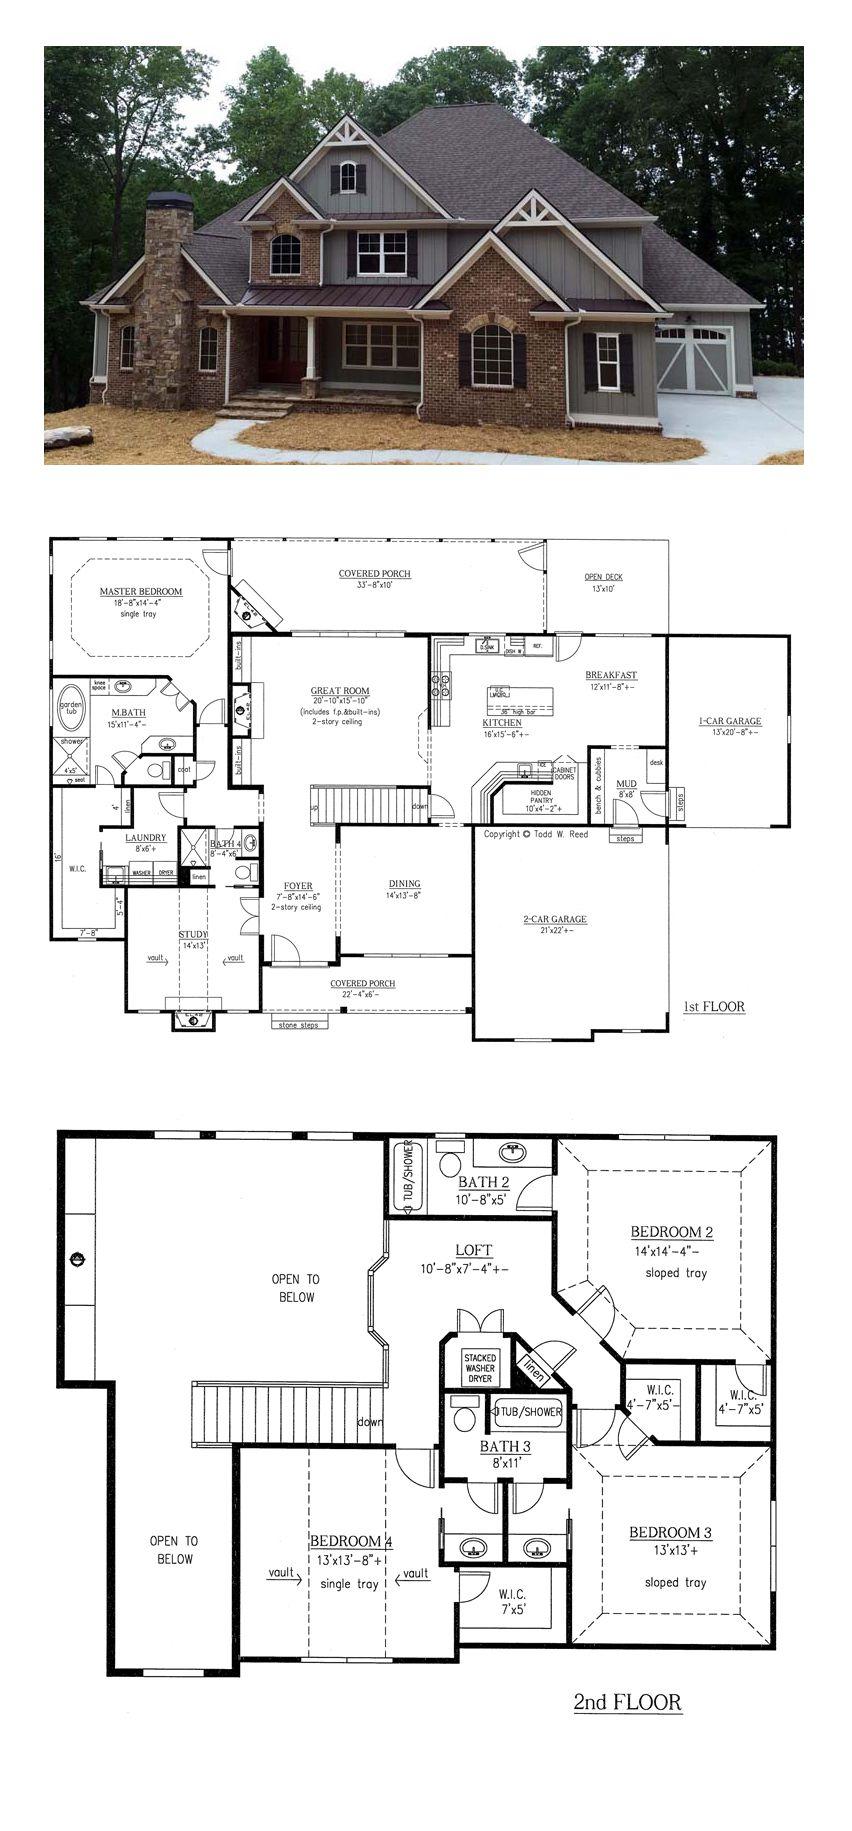 Fresh Prince Of Bel Air House Floor Plan : fresh, prince, house, floor, Mansion, Ideas, Home,, Celebrity, Houses,, House, Styles